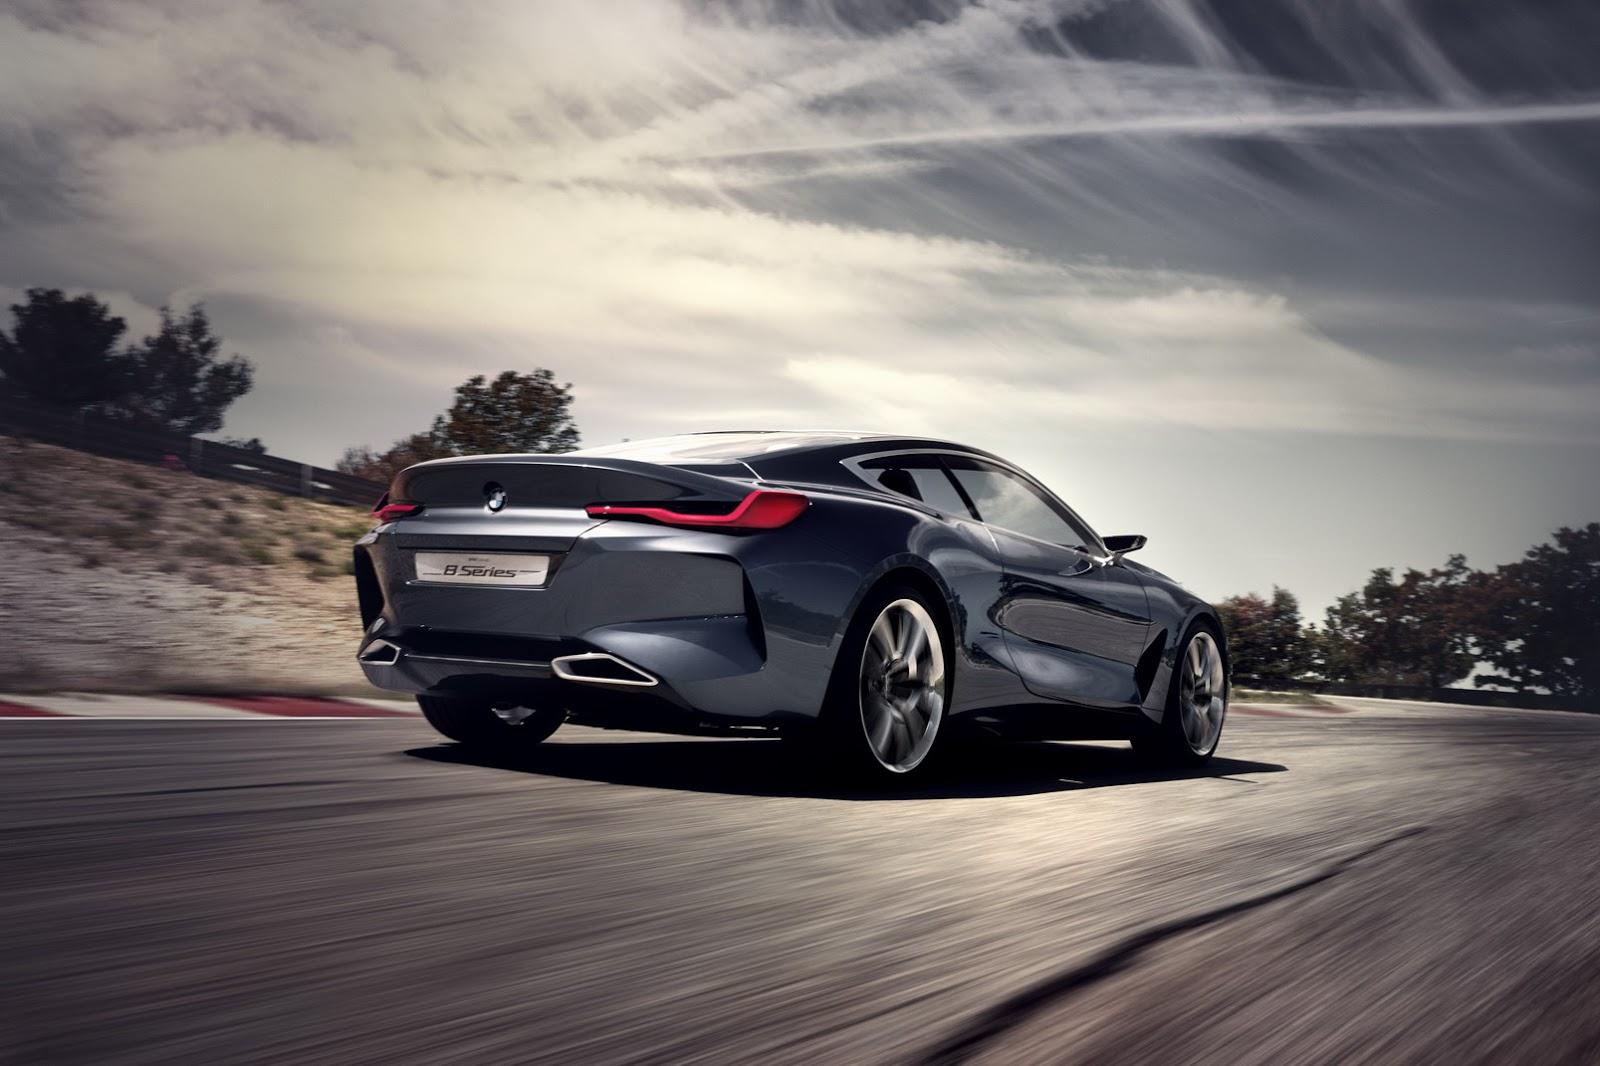 BMW-2019-8-Series-Concept-14